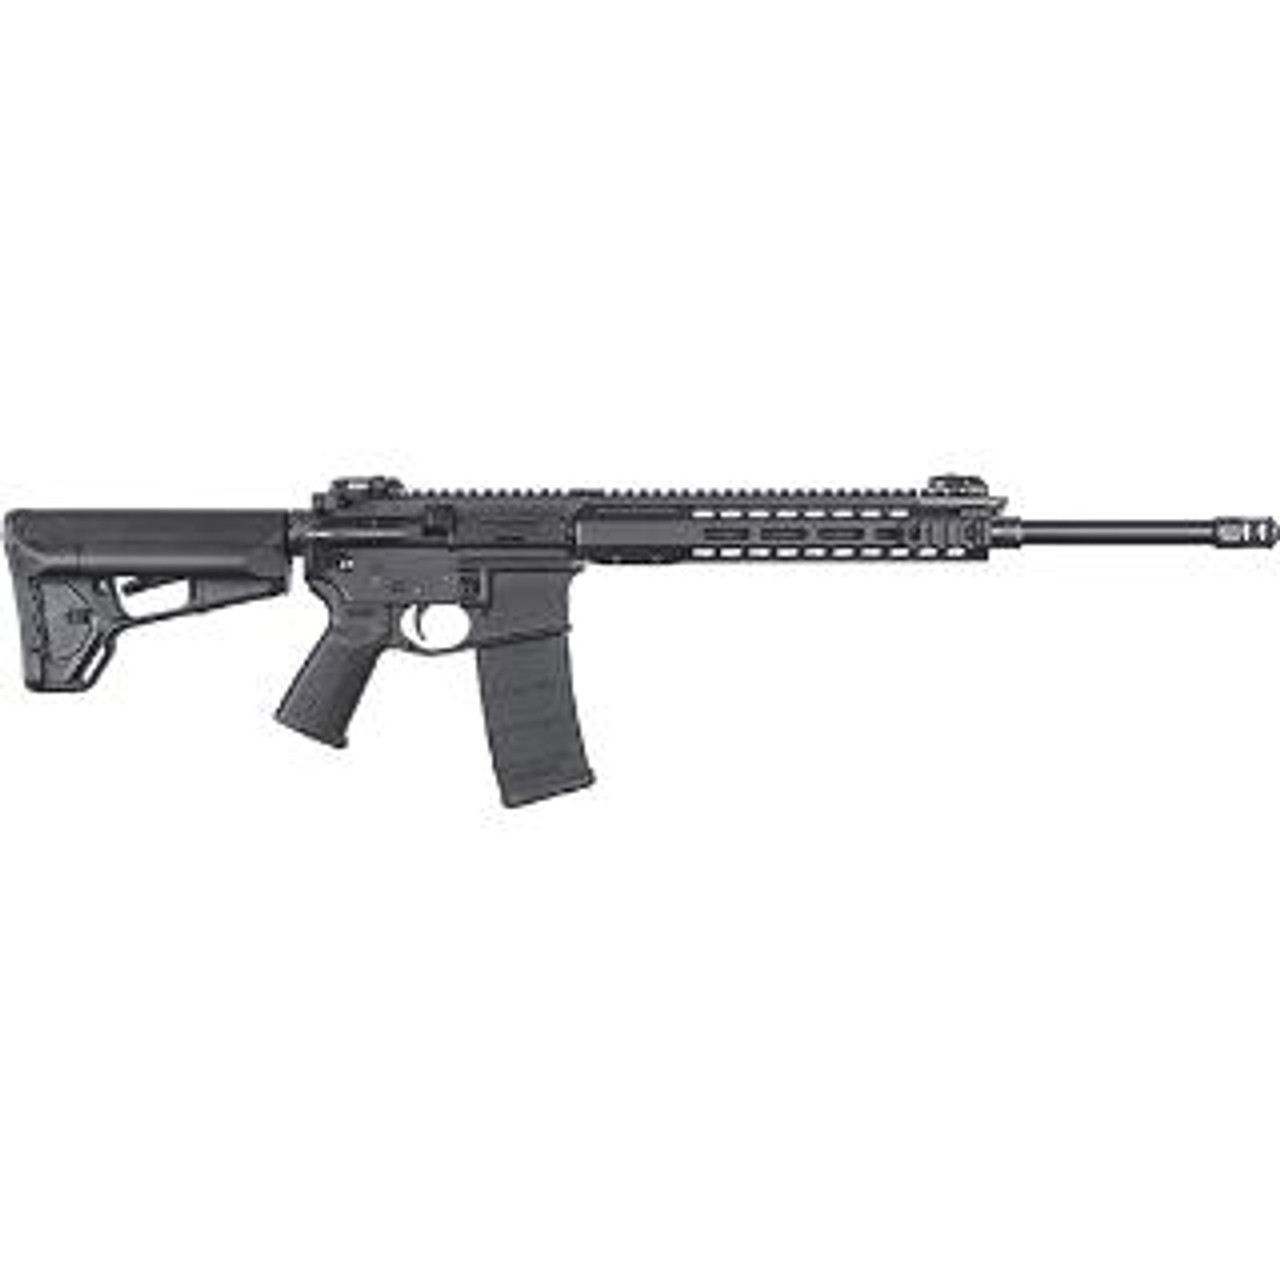 Barrett REC7 DMR CALIFORNIA LEGAL - .223/5.56